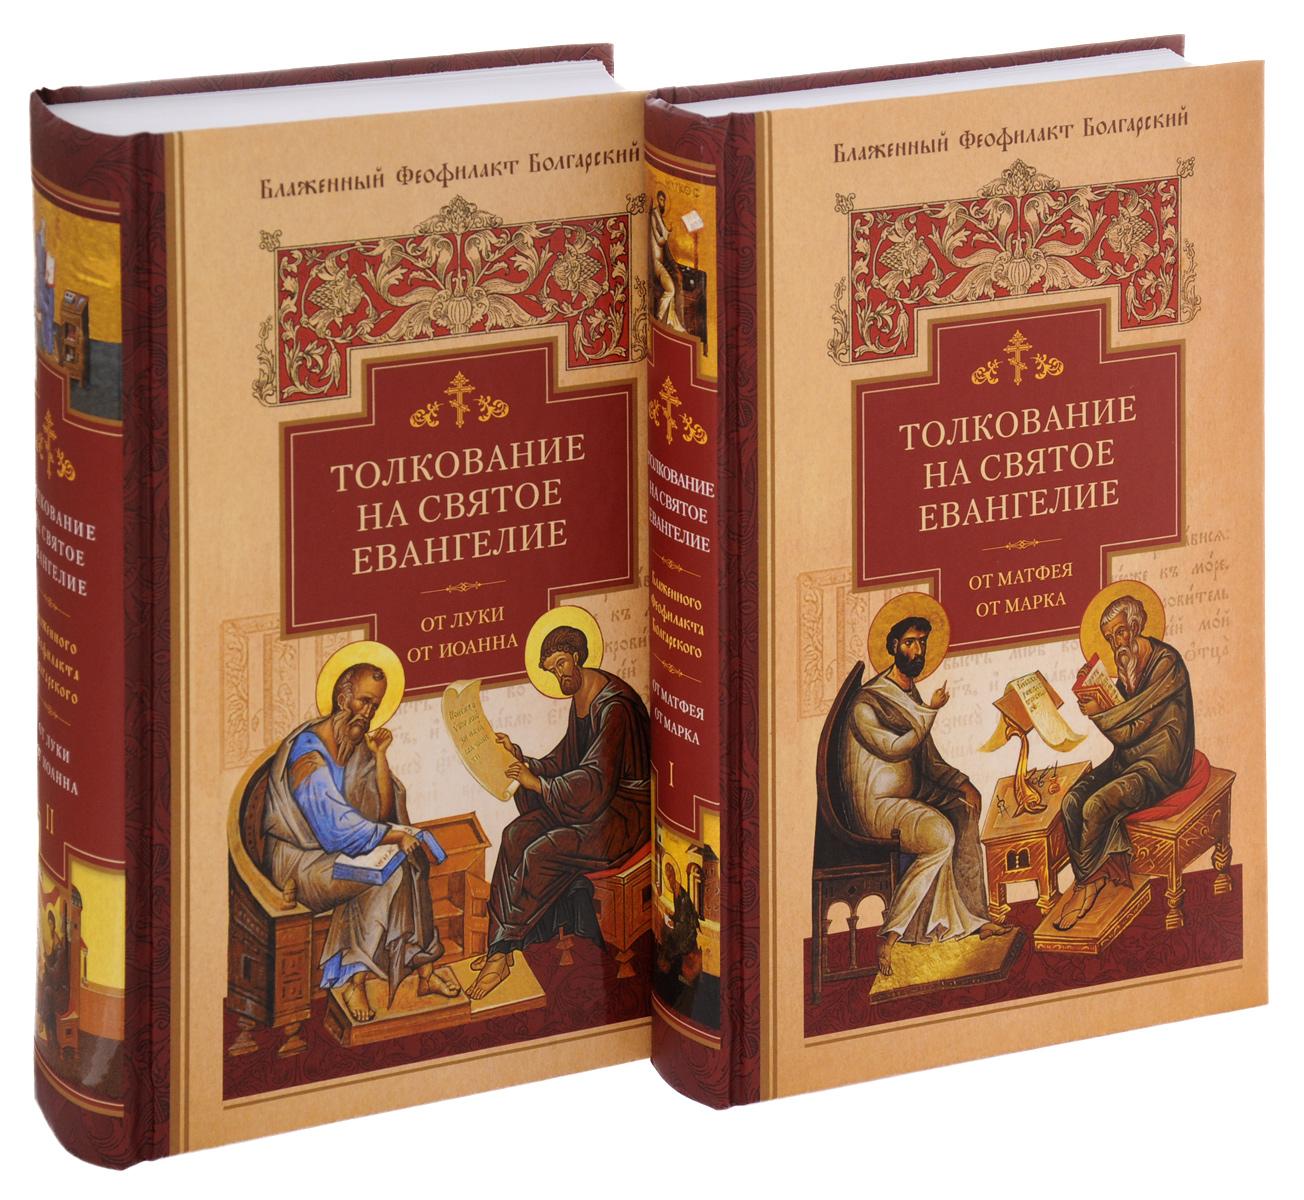 Толкование на Святое Евангелие. В 2 томах (комплект)